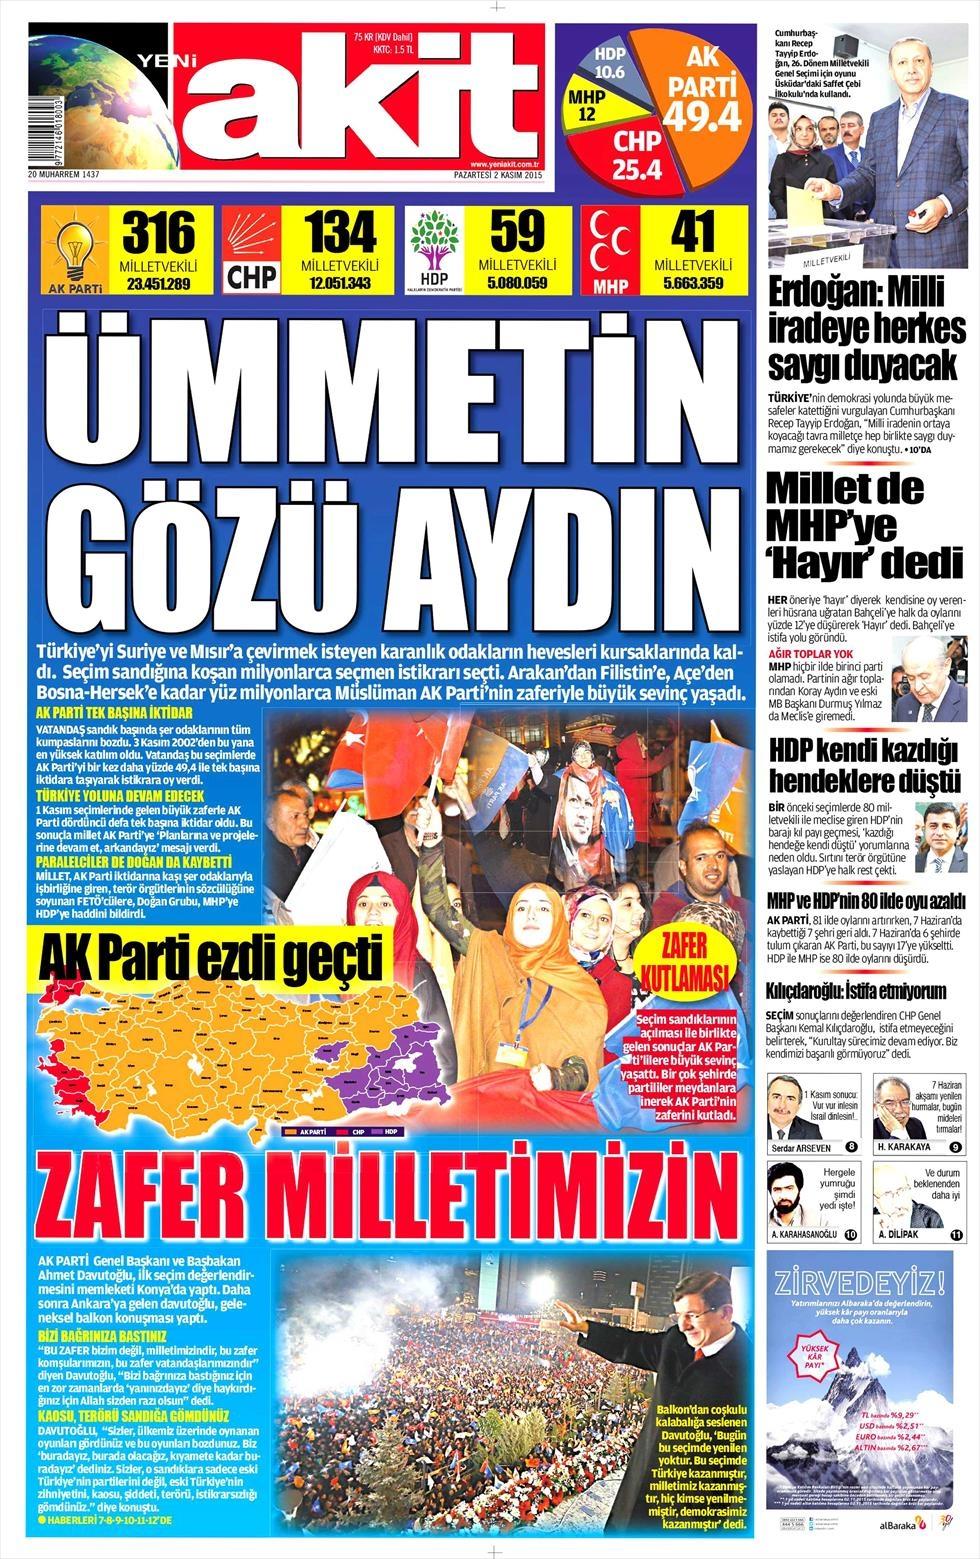 Seçim manşetleri 18